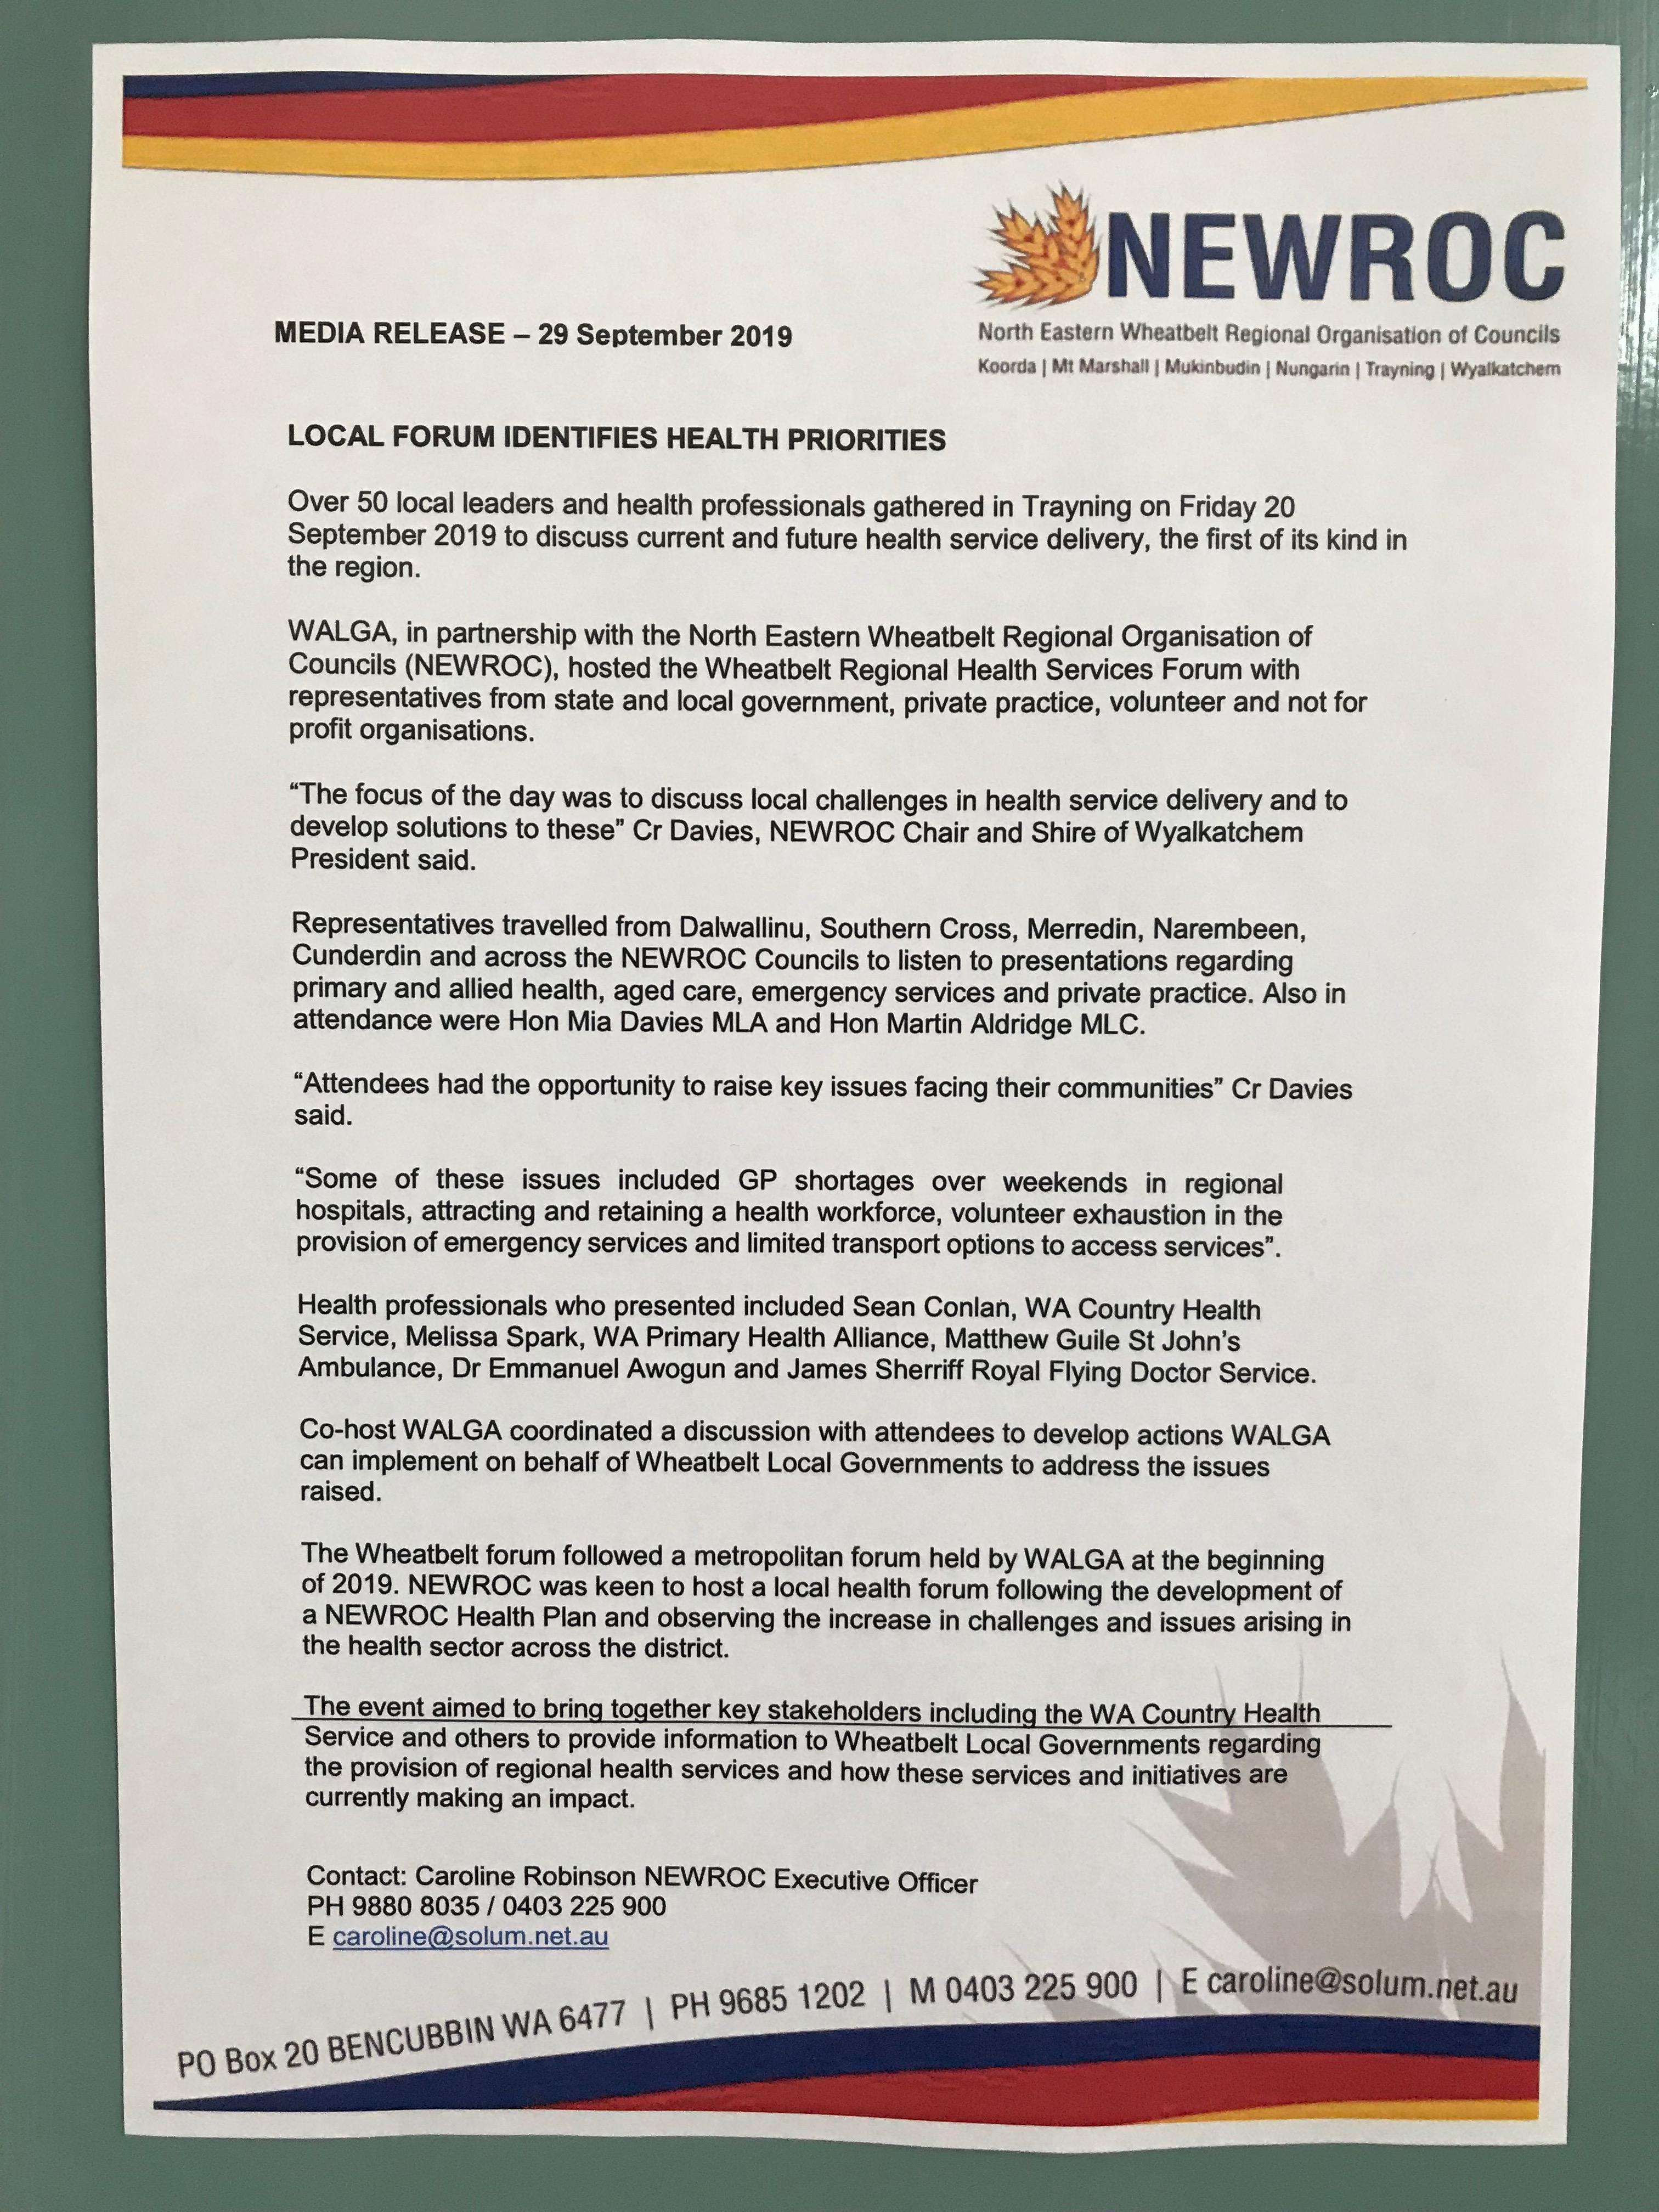 Newroc media release